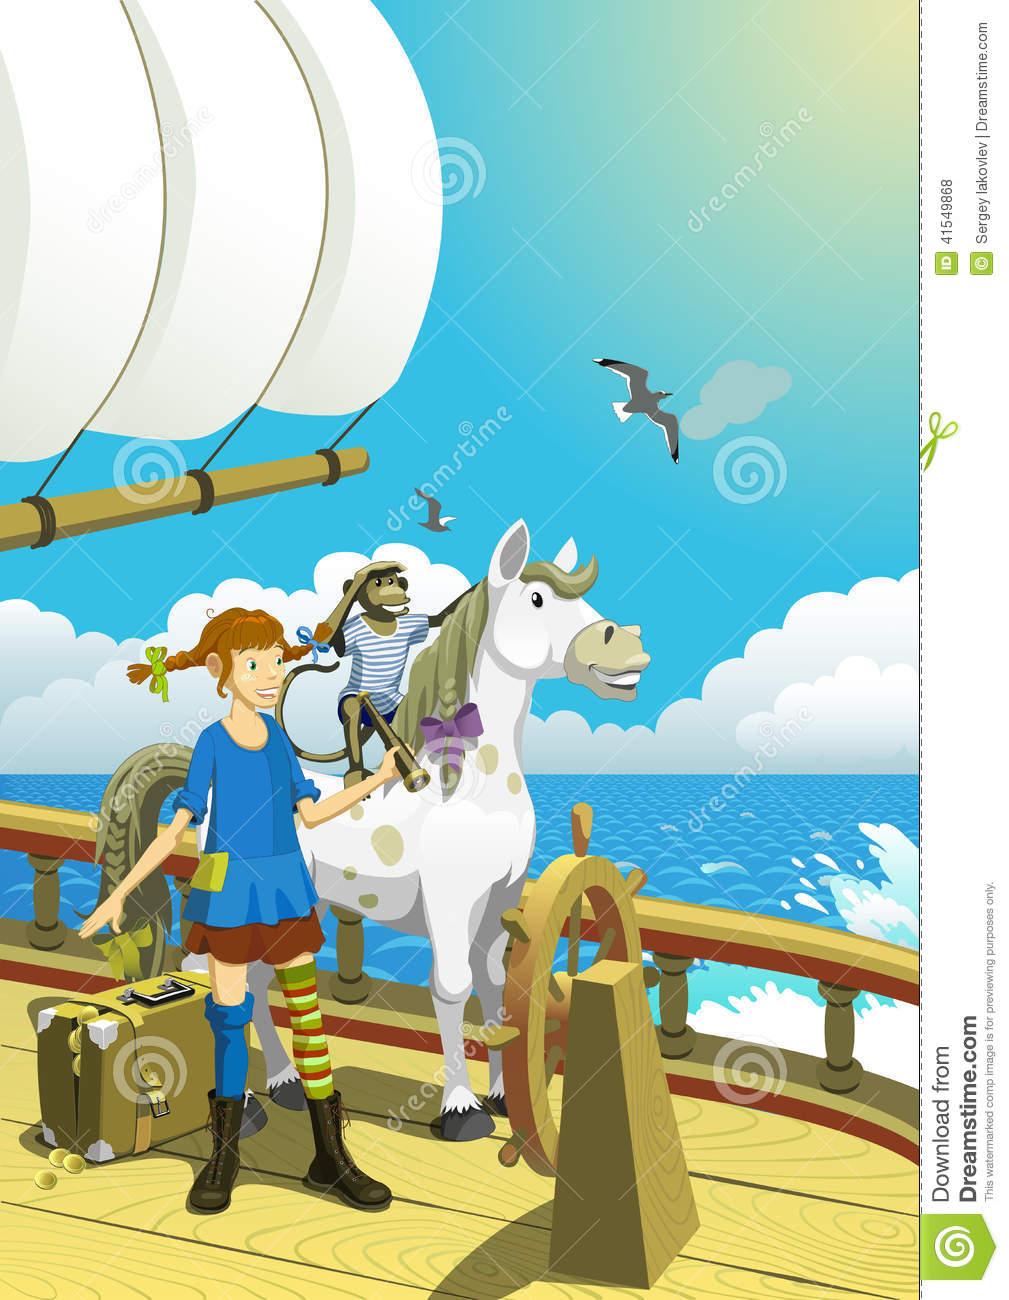 Pippi Longstocking In The South Seas Stock Vector.